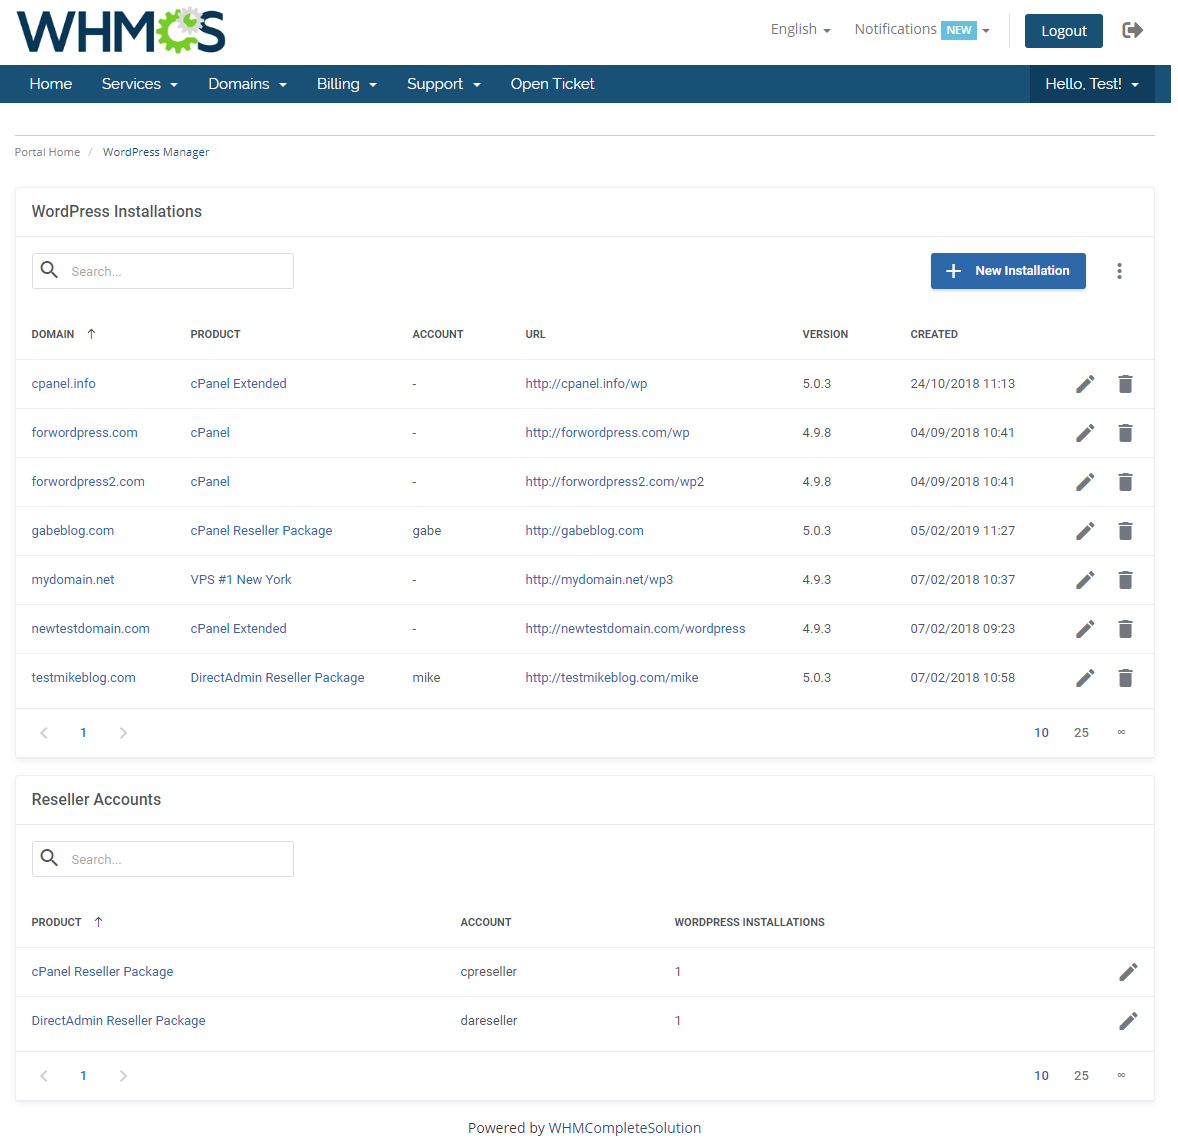 WordPress Manager For WHMCS: Module Screenshot 1